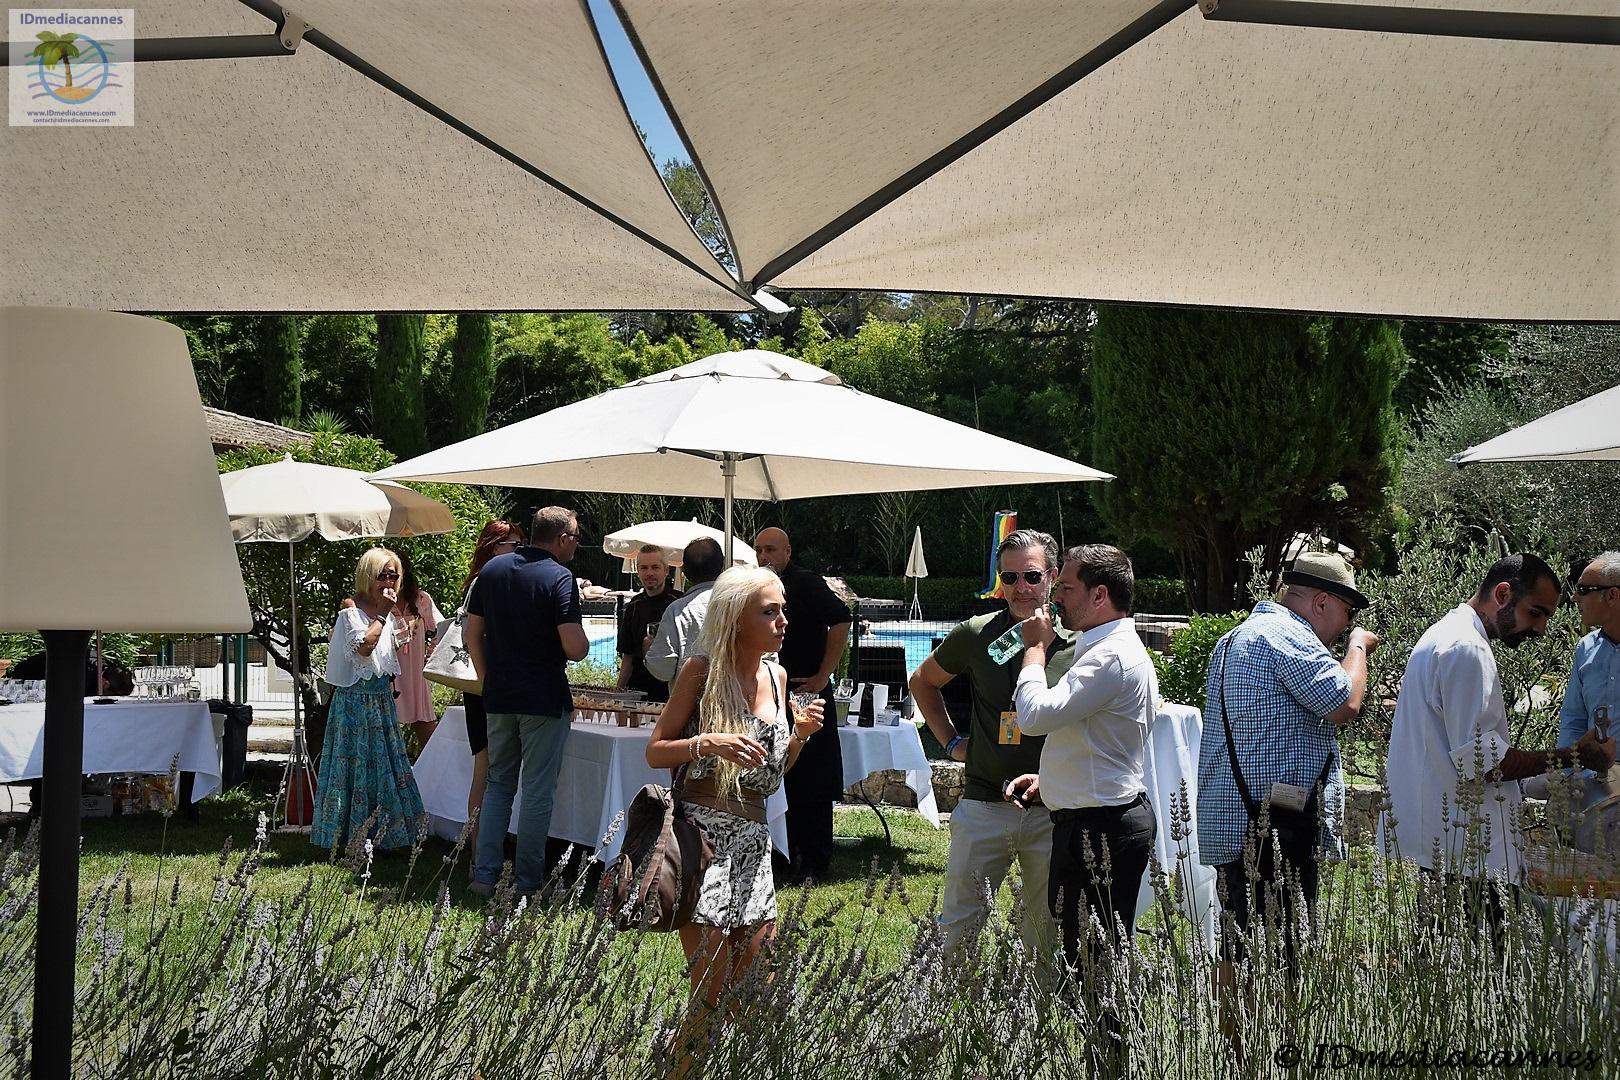 Les etoiles de mougins 2017 basile arnaud idmediacannes for Le jardin mougins restaurant